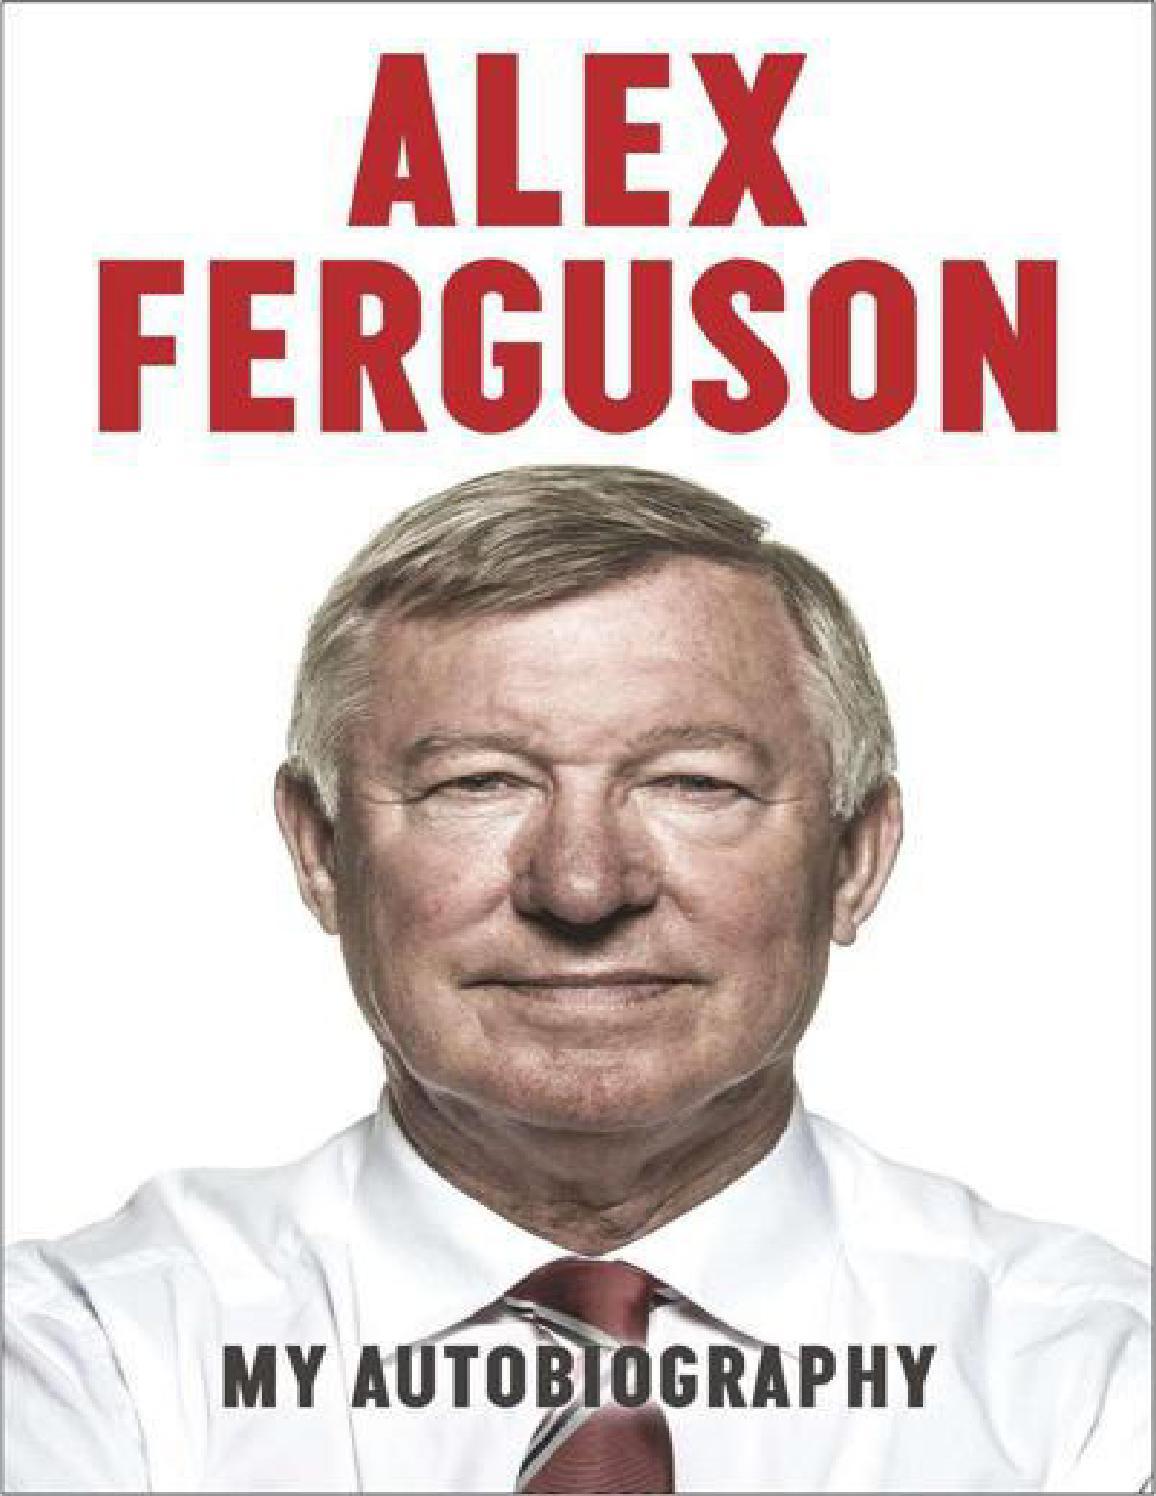 Crazy and enticing Peter Ferguson 59